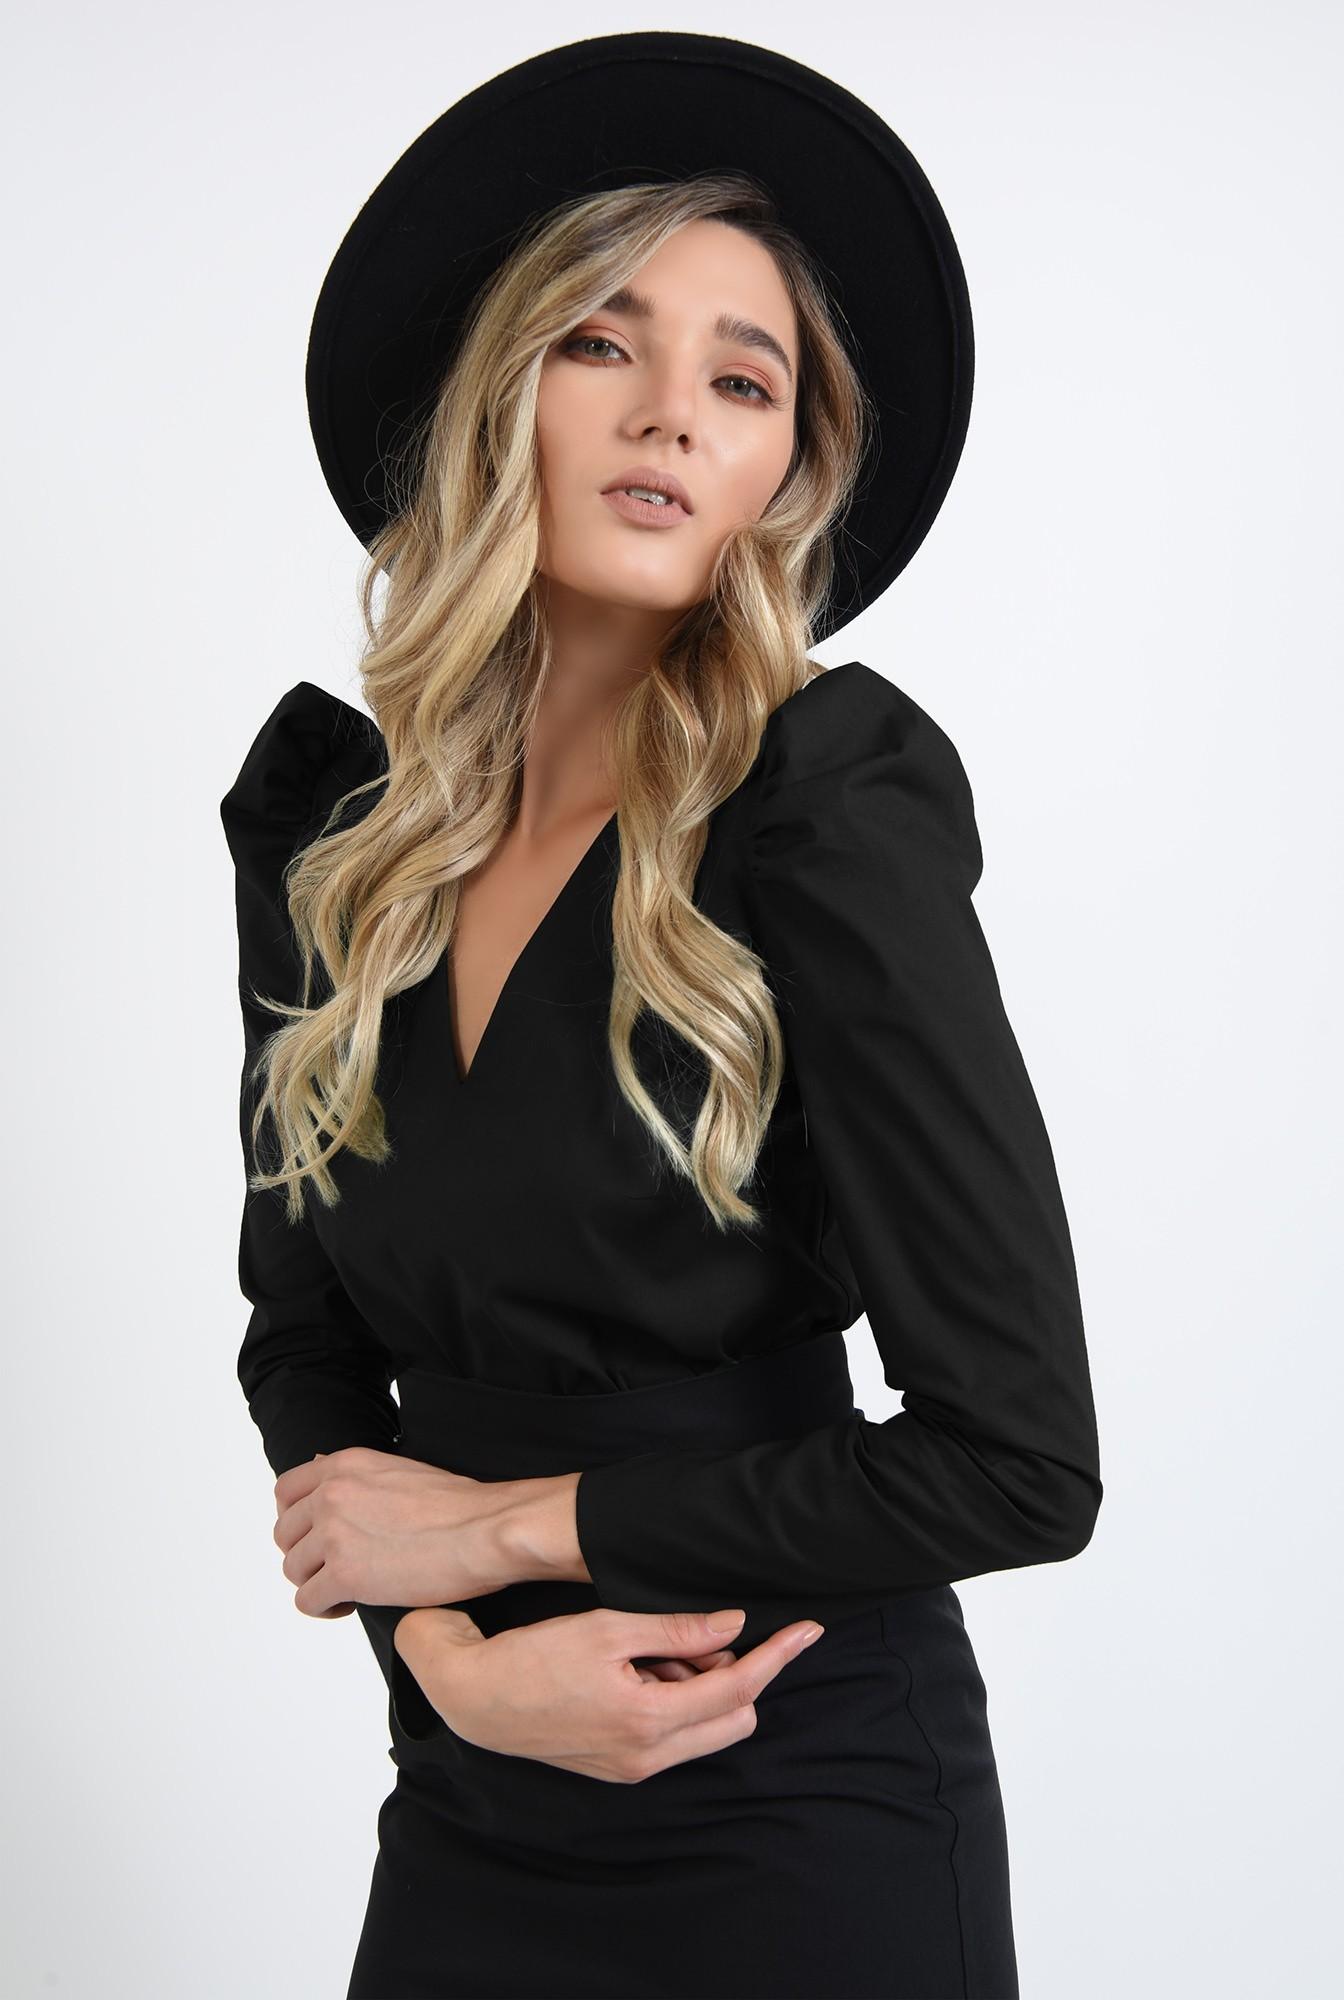 2 - bluza neagra, cu umeri accentuati, cu maneca lunga